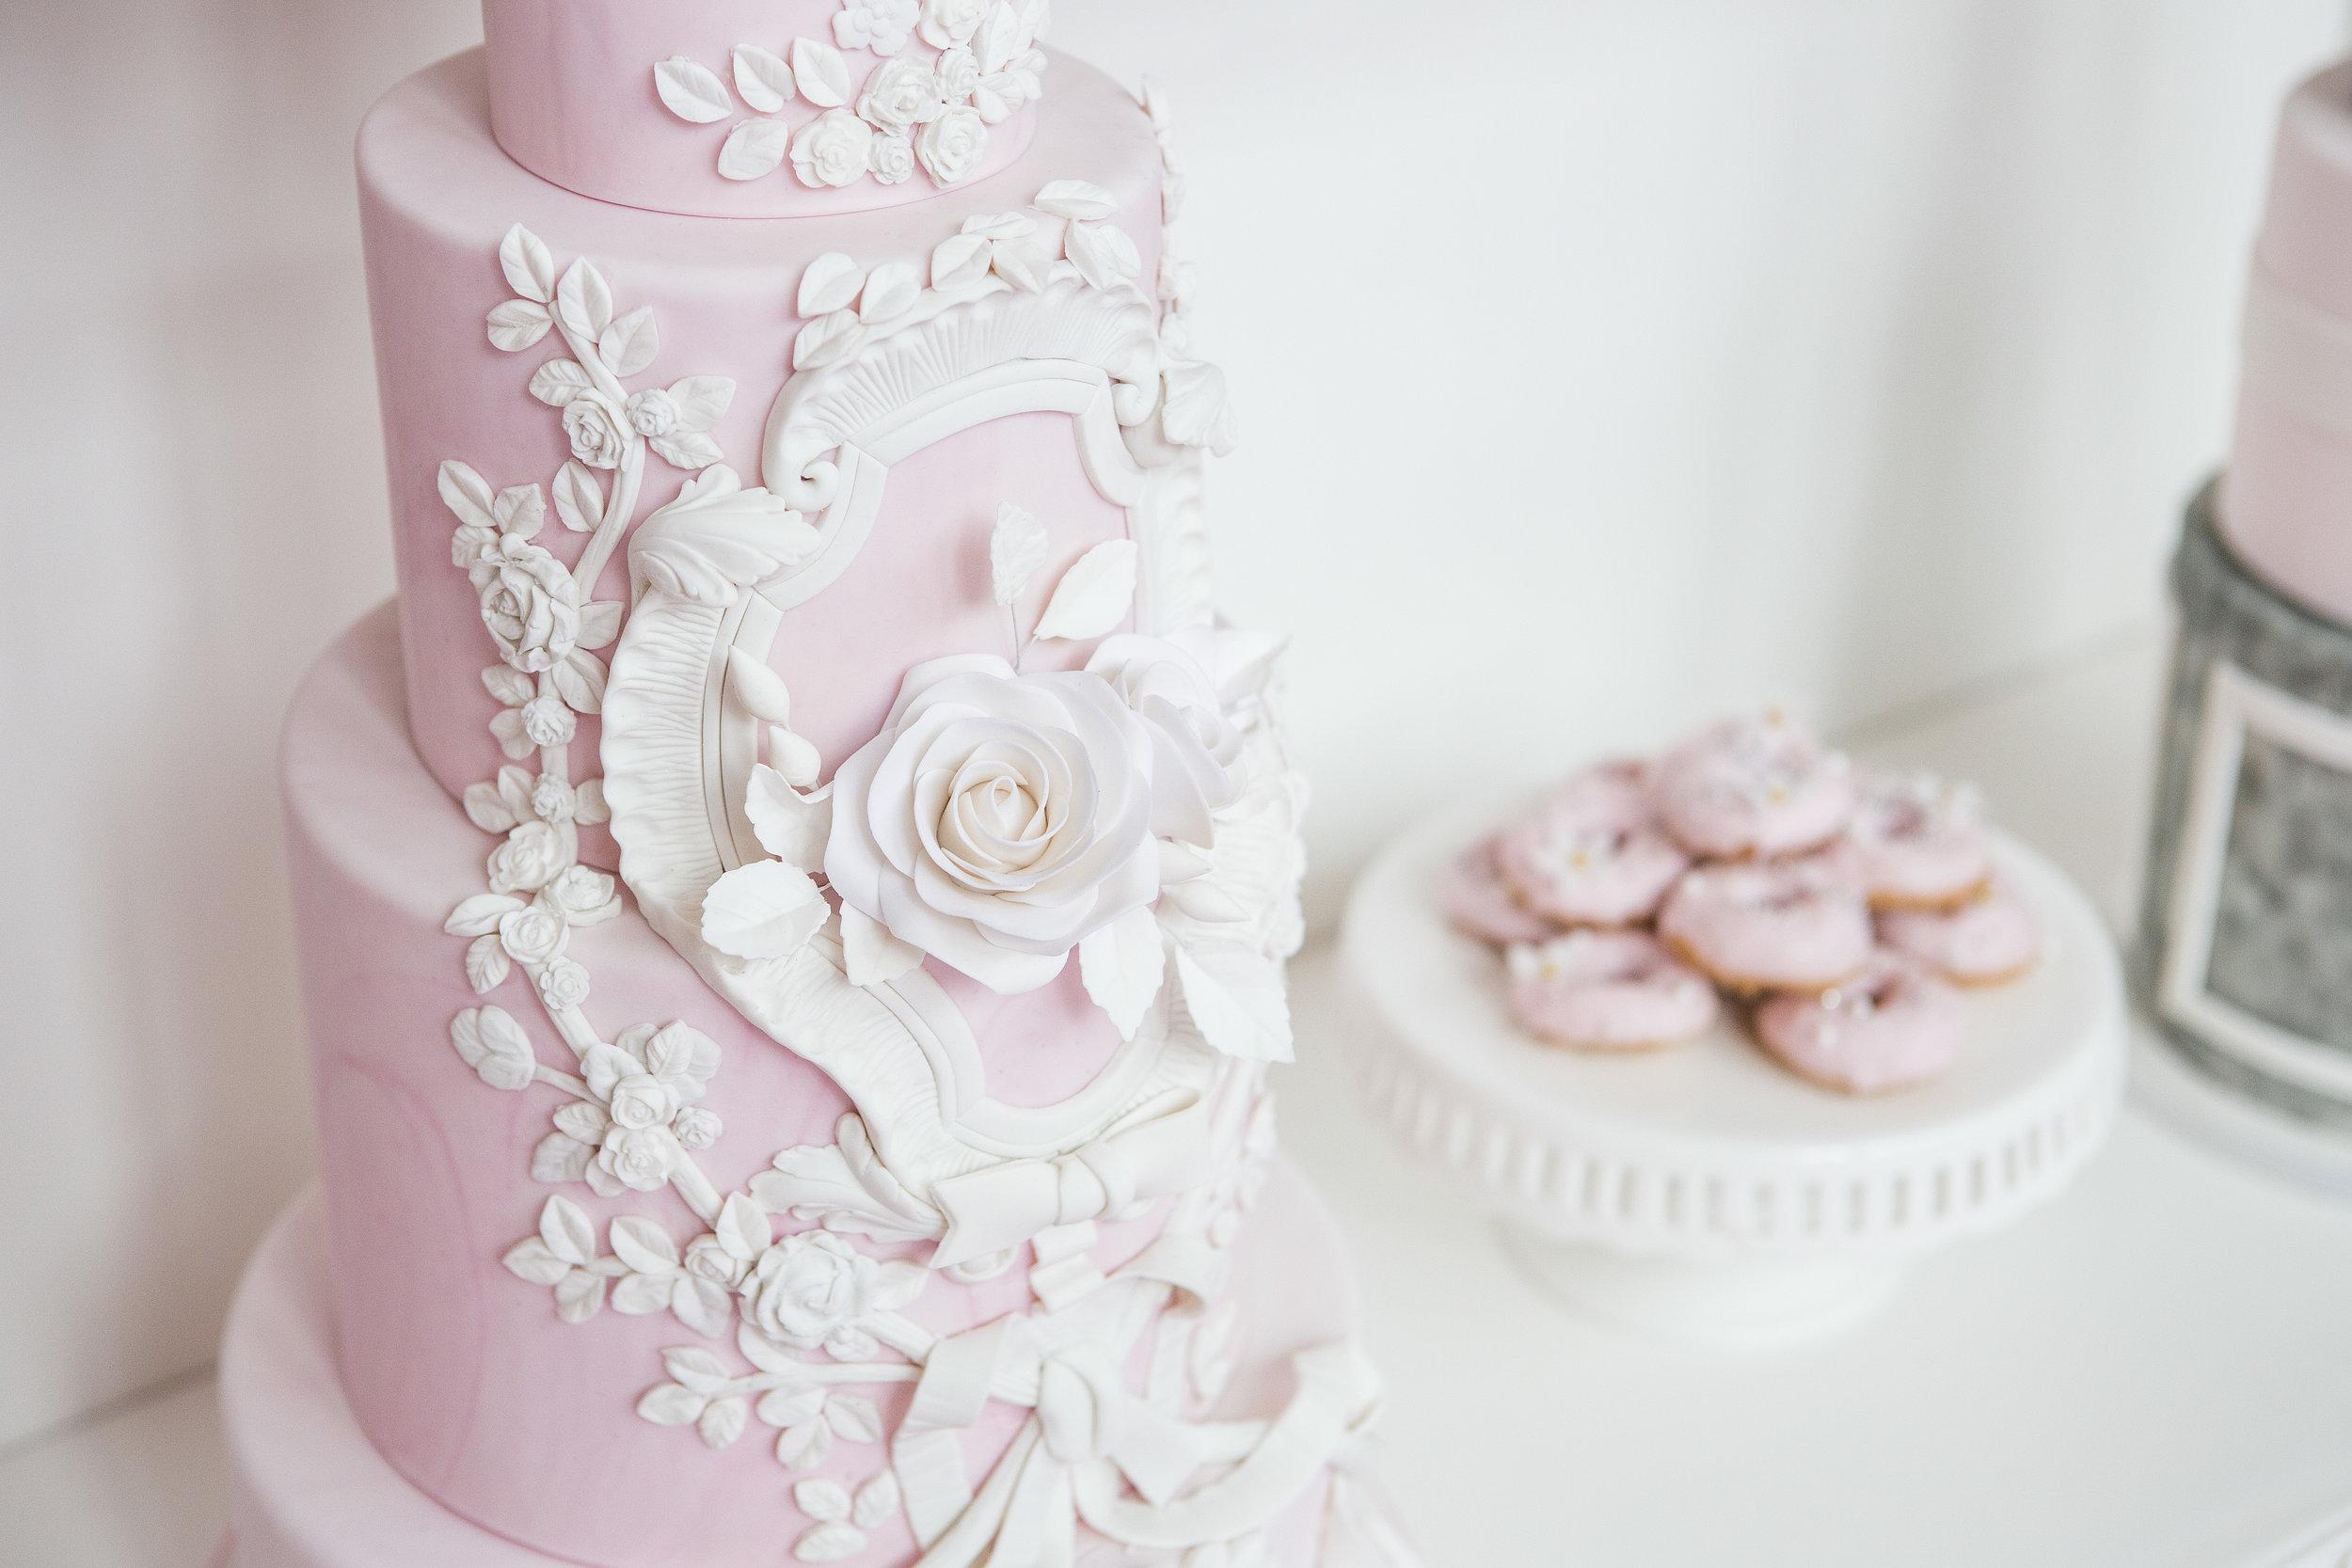 August In Bloom - Pink Cake - Dior Darling (Wedluxe)